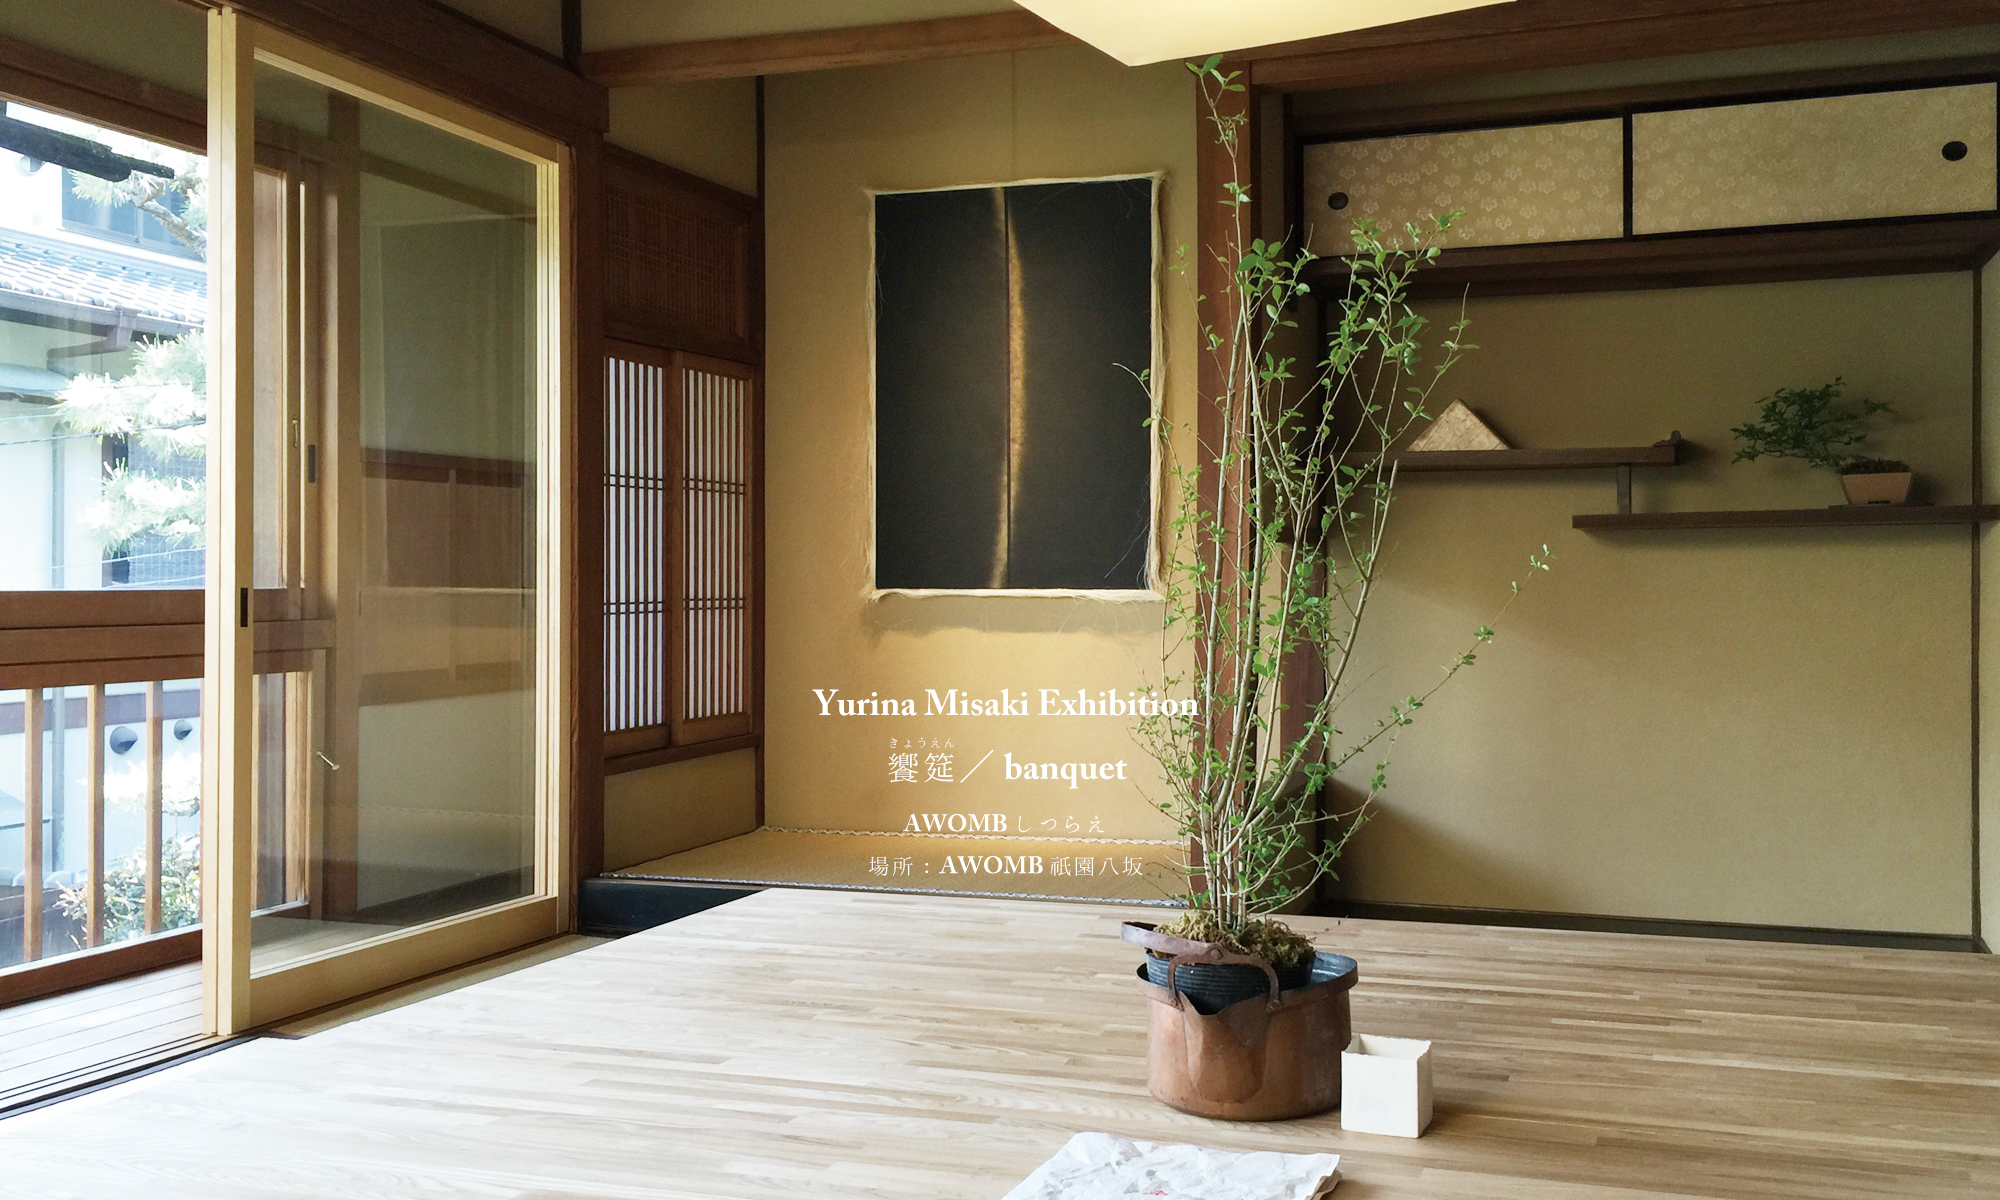 Yurina Misaki Art Works Website